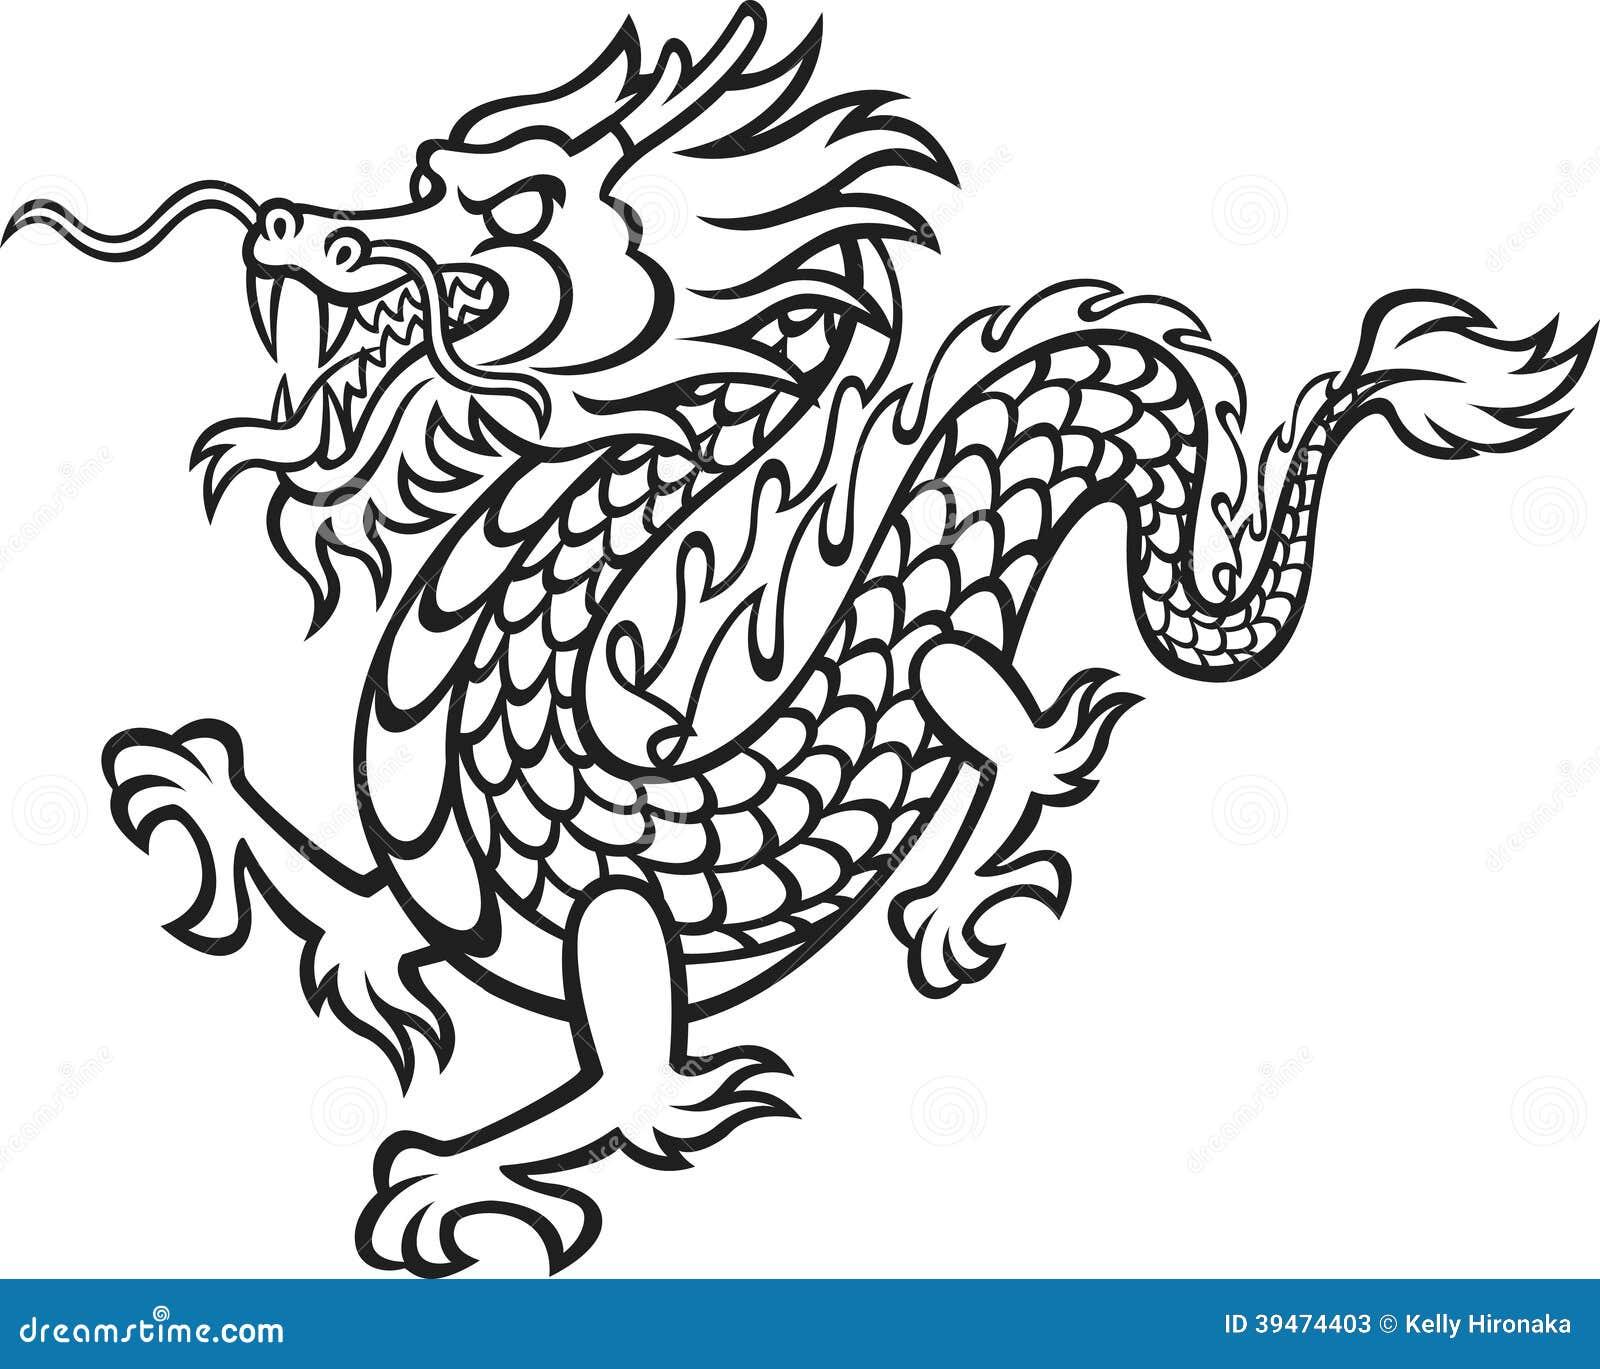 Ausmalbilder Lego Elves Drachen: Black And White Dragon Stock Vector. Image Of Furious